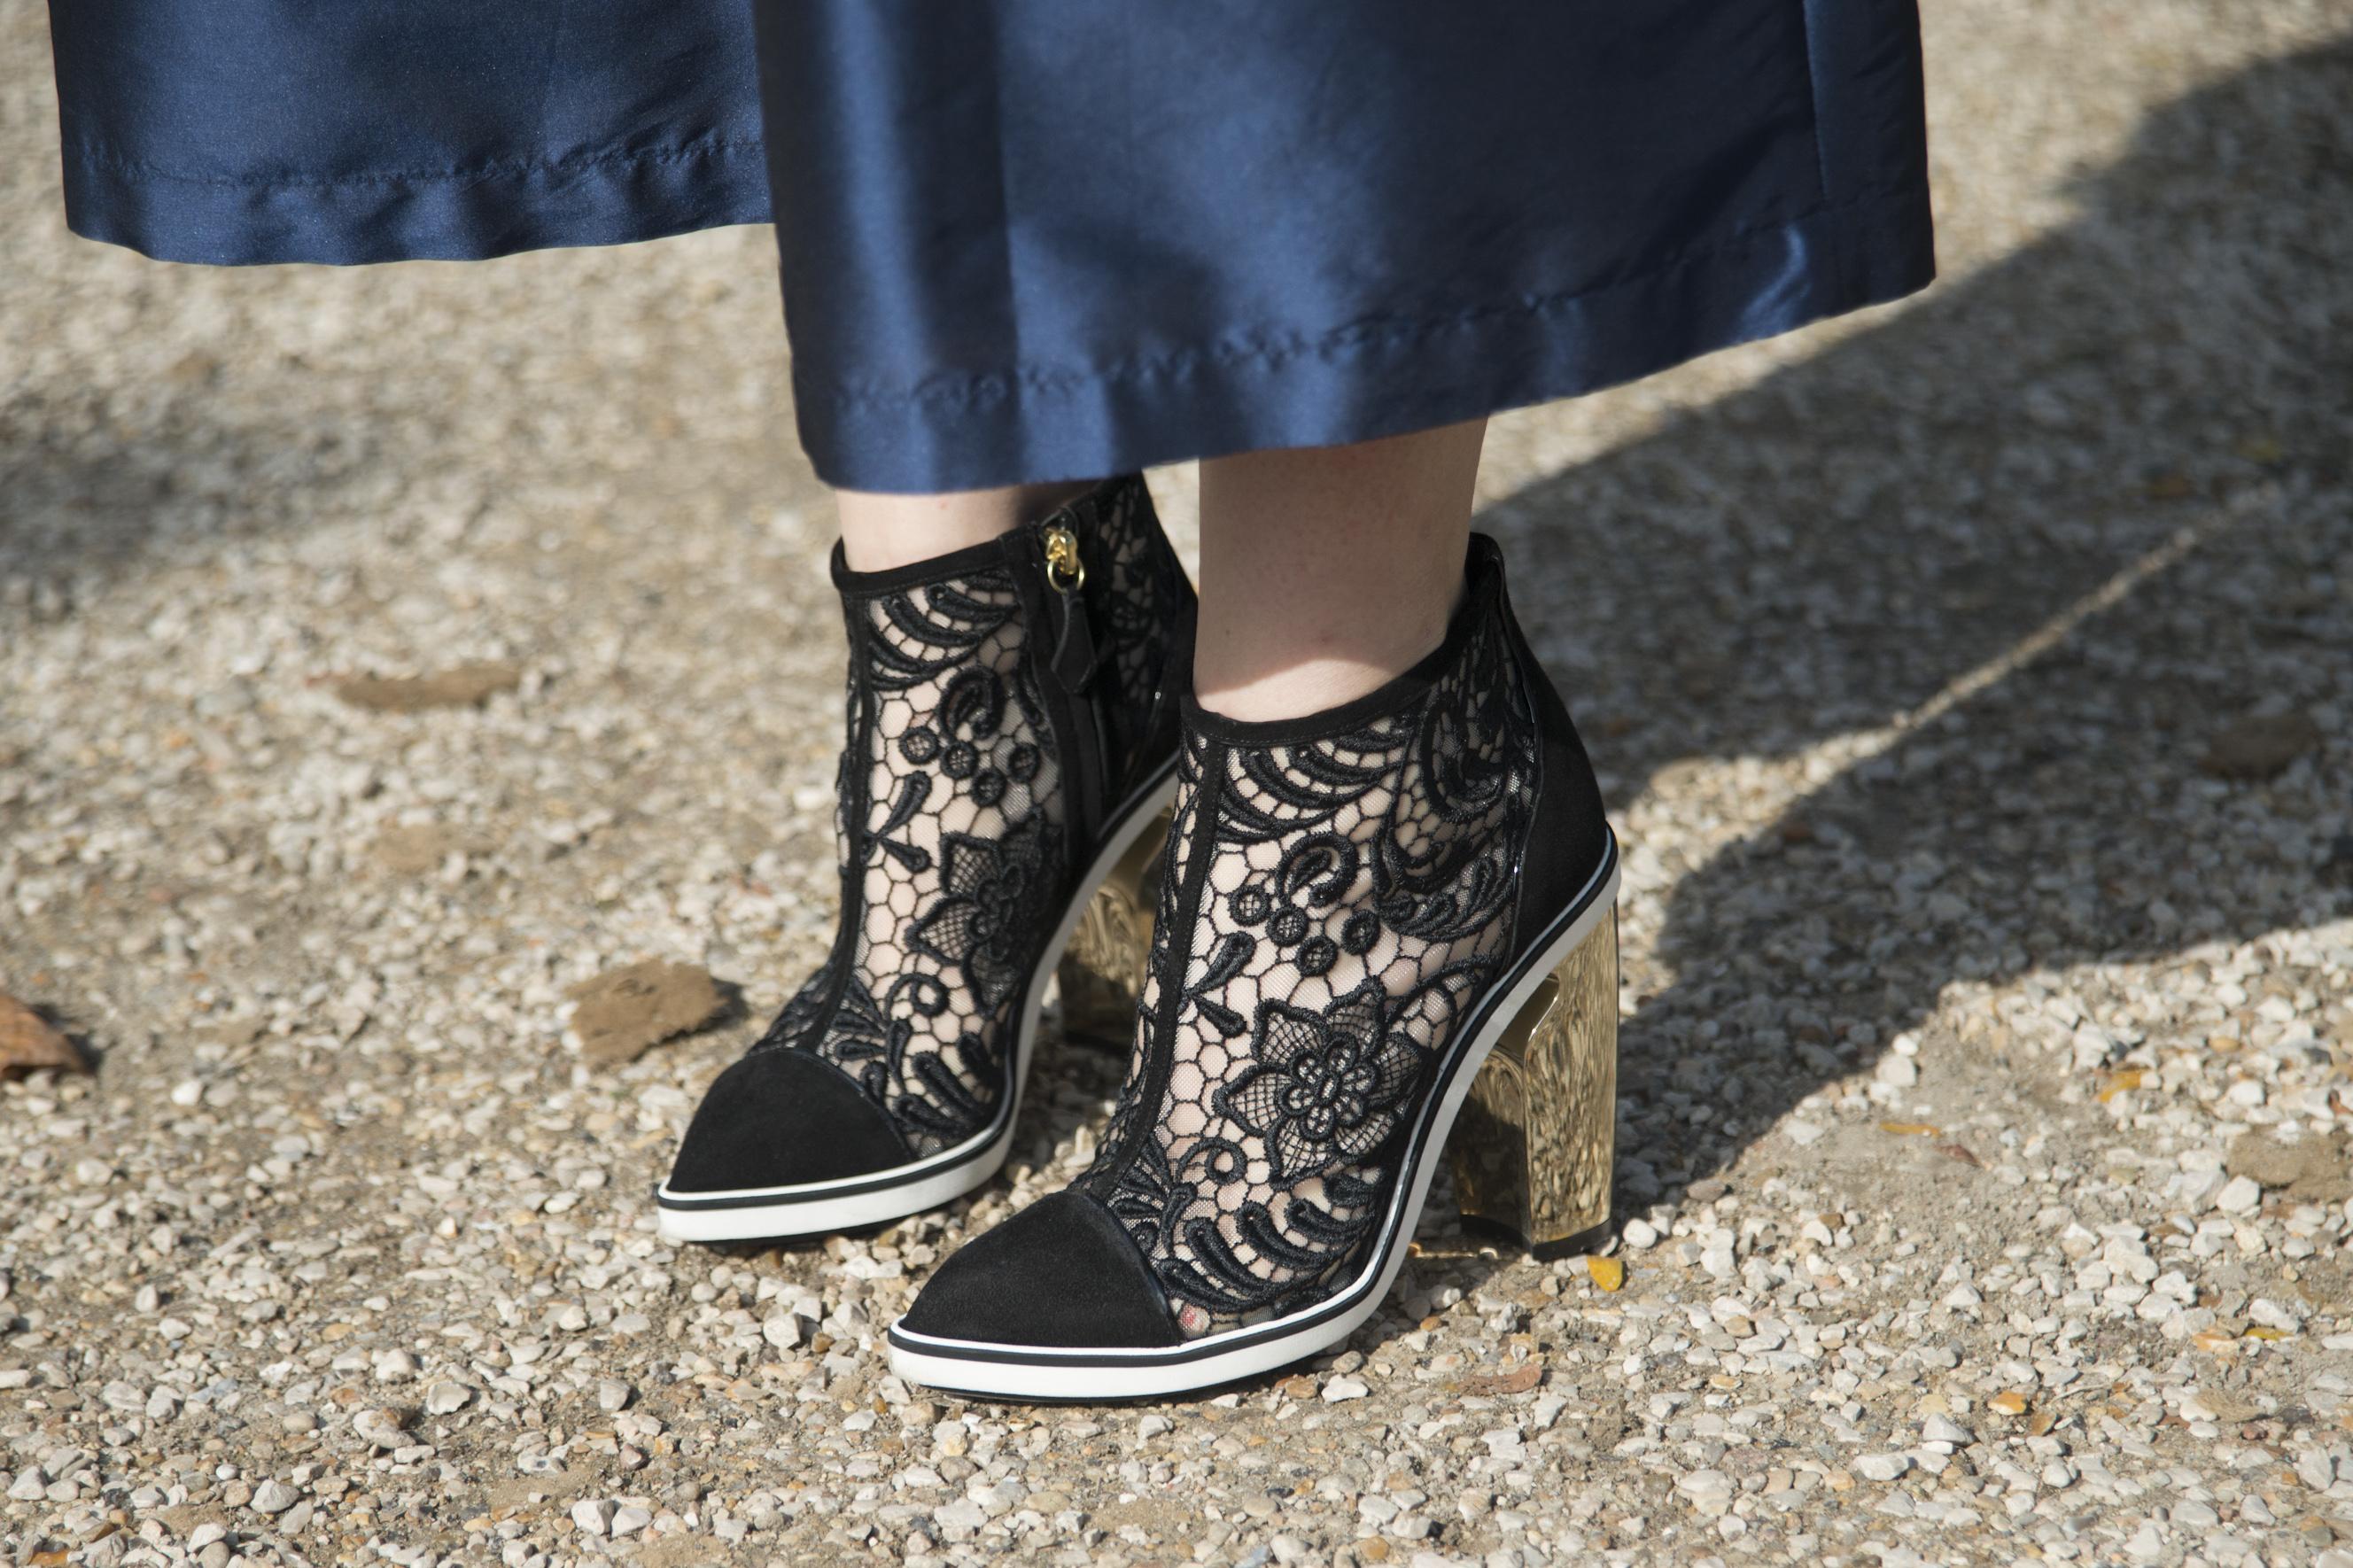 Nicholas Kirkwood shoes spotted at Paris Fashion Week in September 2014